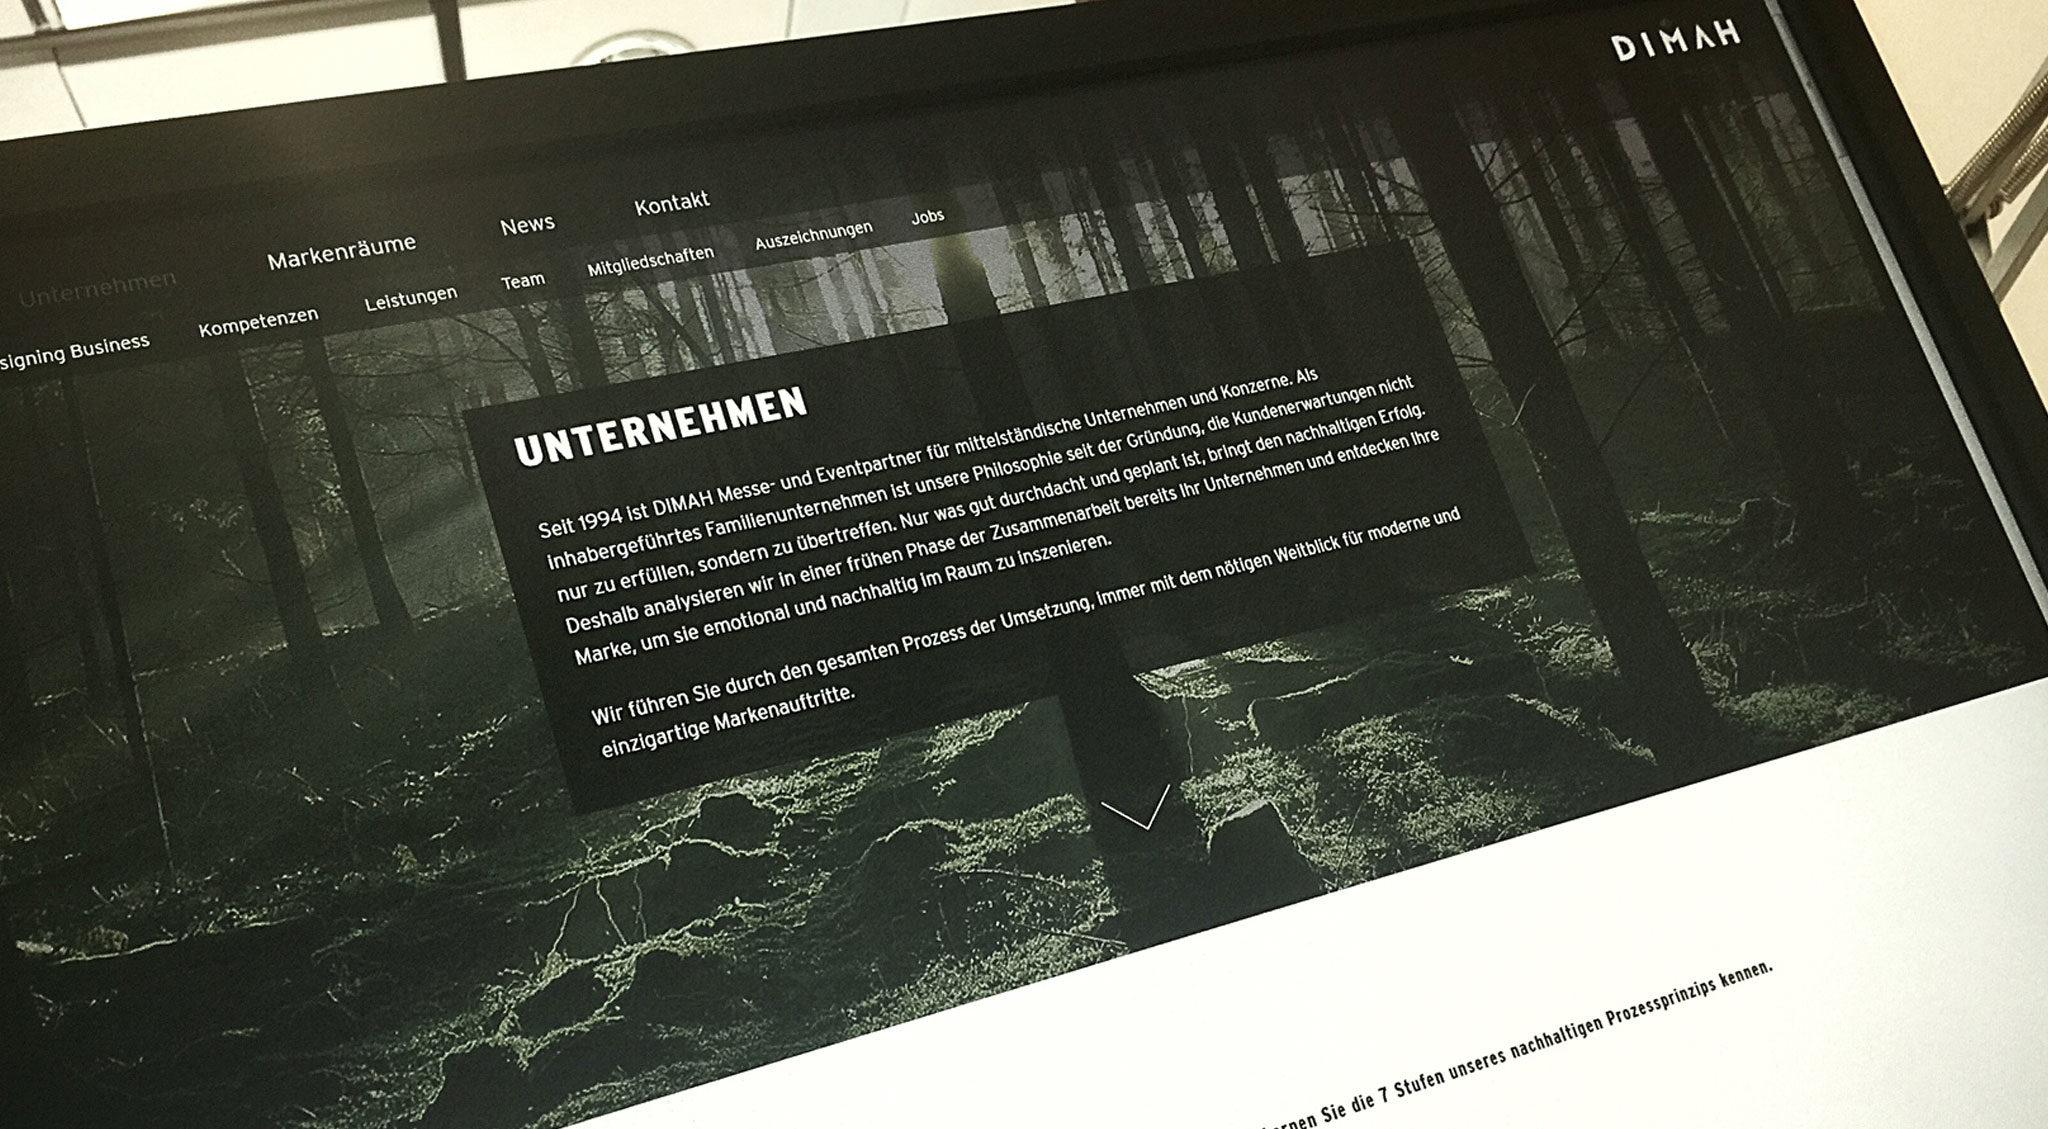 DIMAH Messe + Event – Website Launch